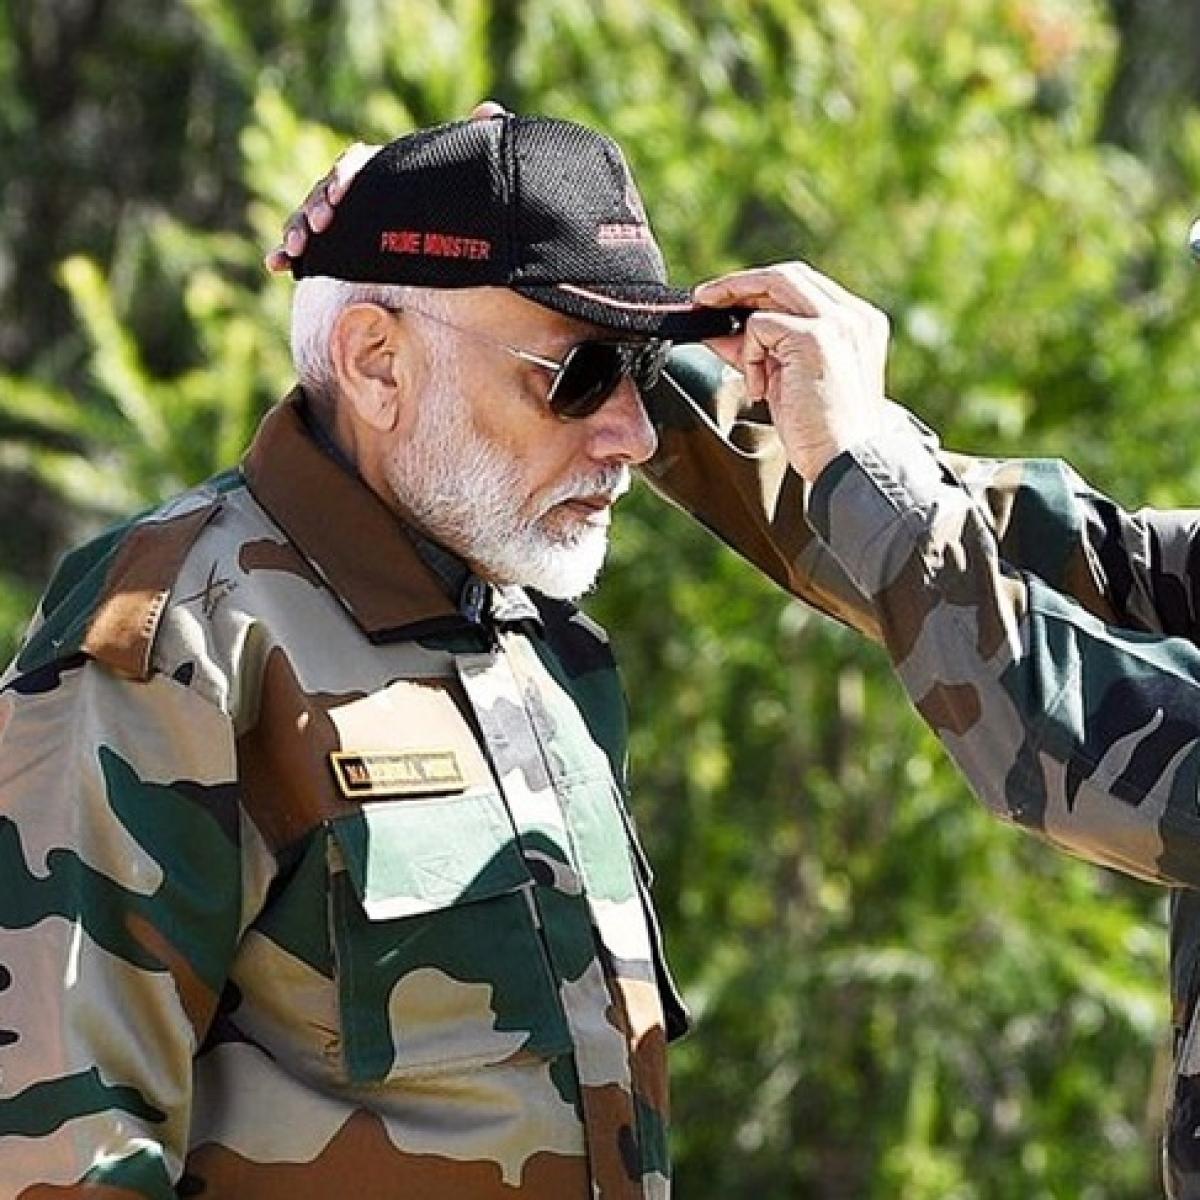 'No one does it better than him': BJP hails PM Modi's Ladakh visit